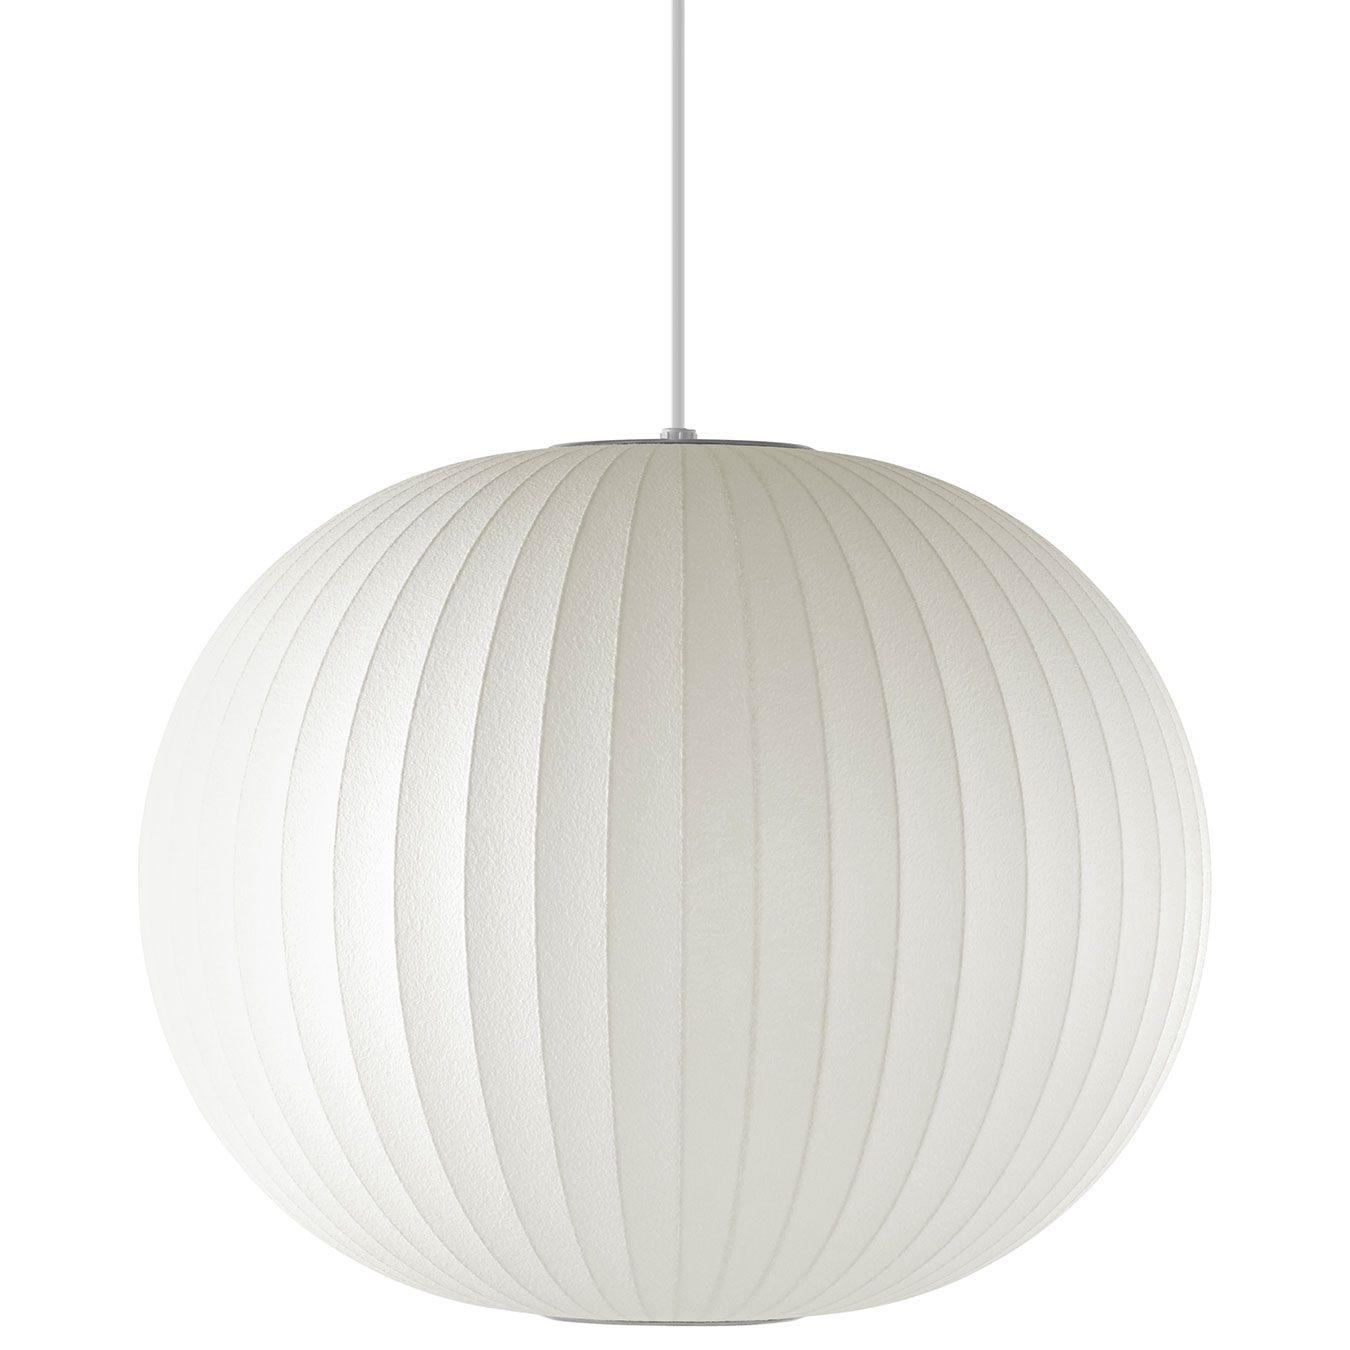 Ball Pendant by Nelson Bubble Lamps H761SBNS Nelson